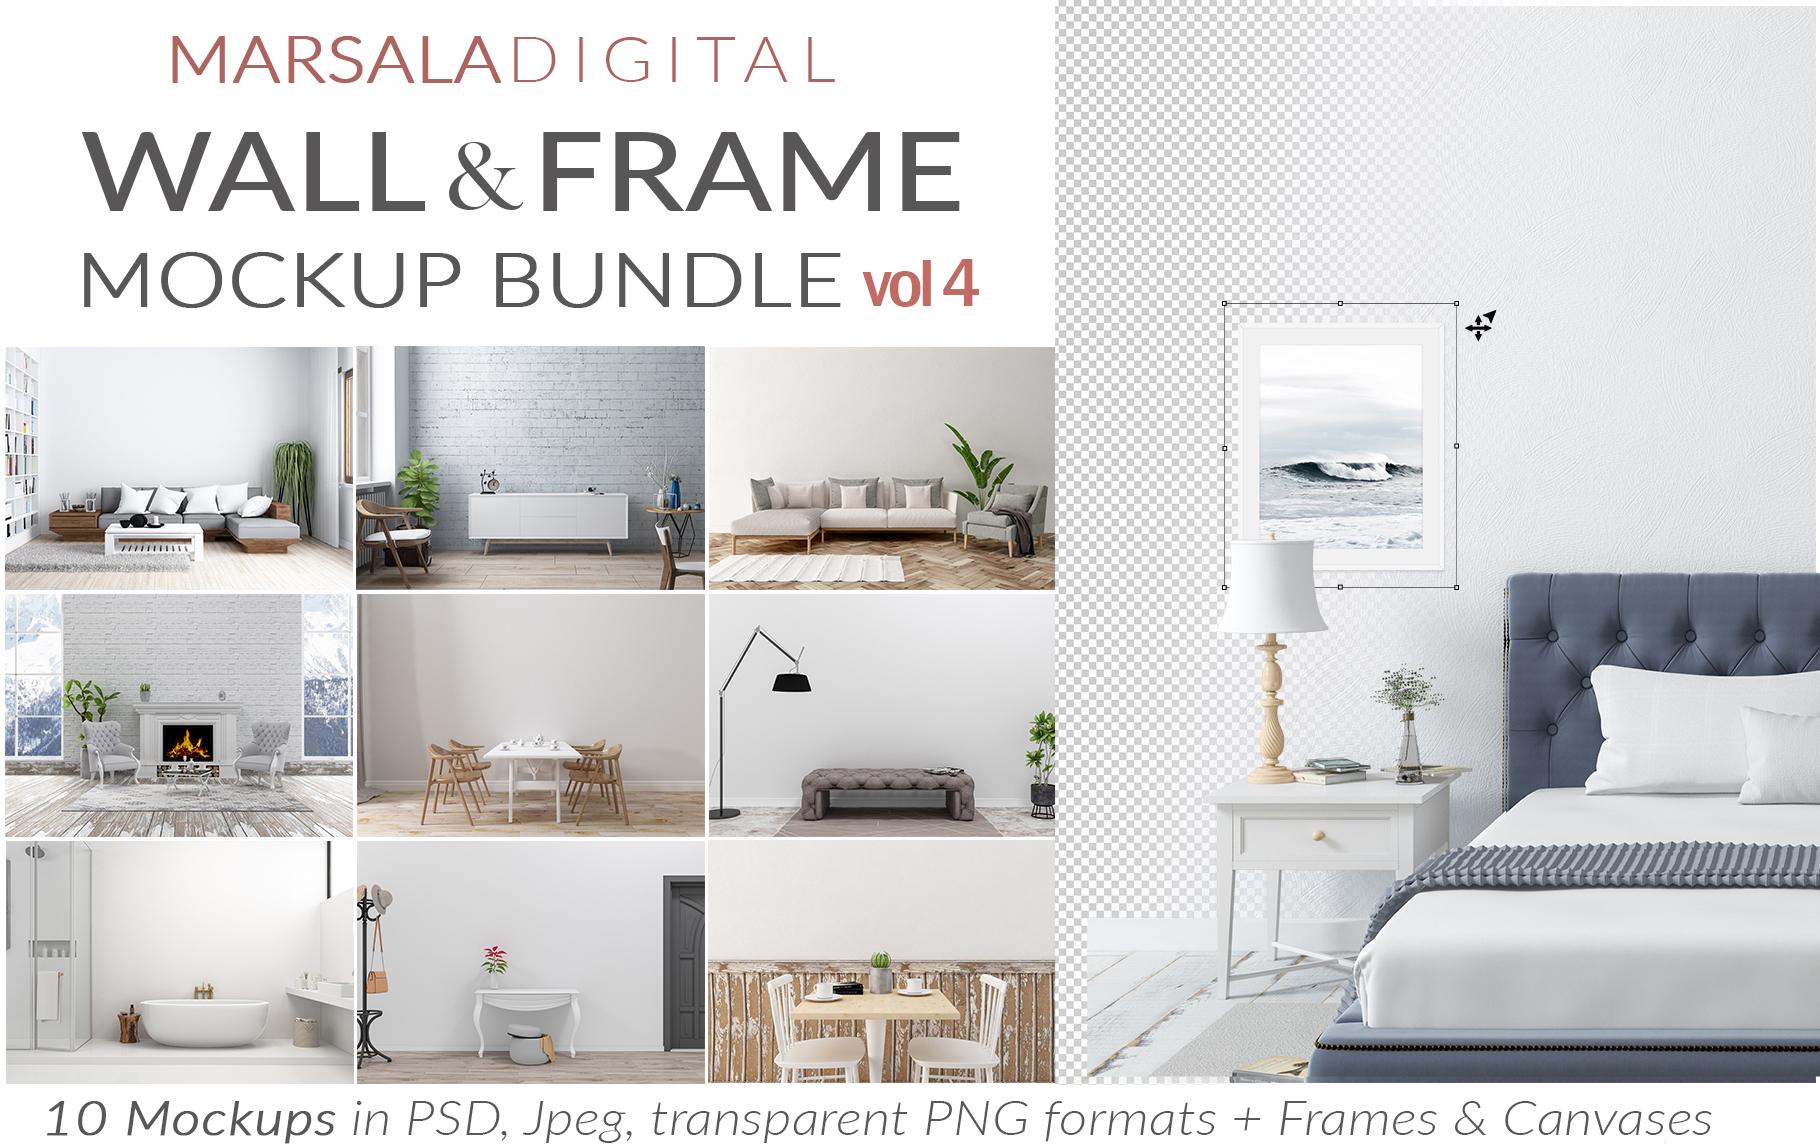 Massive Interior Wall Mockup, Frame Mockup Bundle FREE sampl example image 12